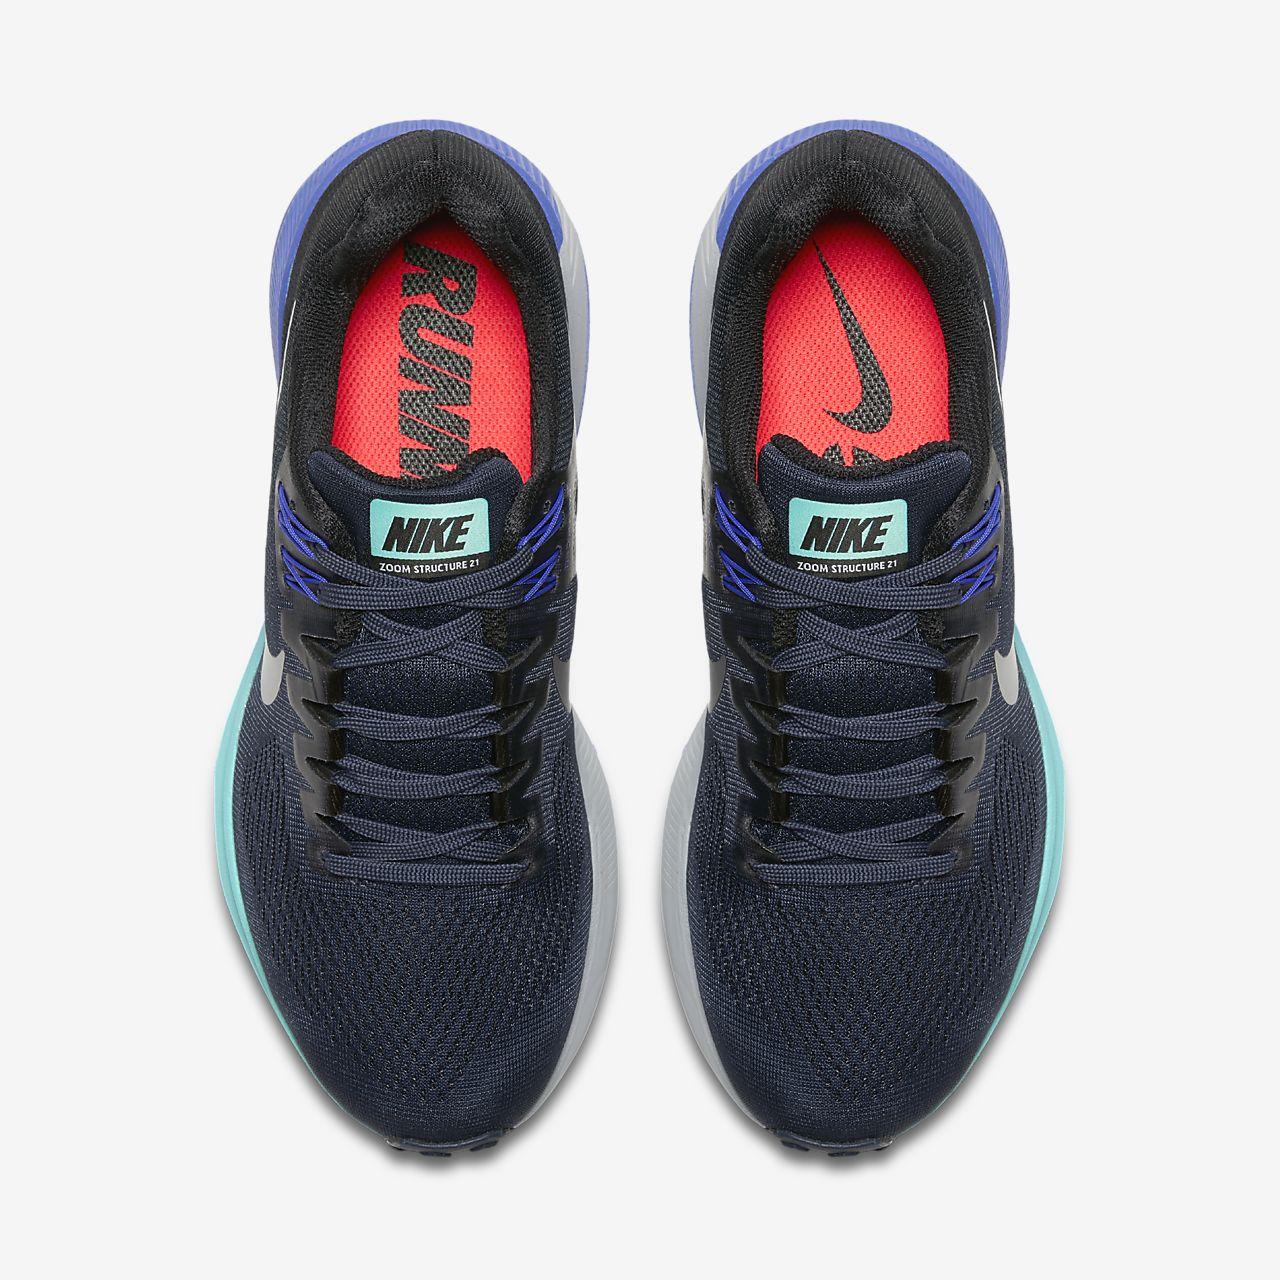 5699f4d4167313 Nike Air Zoom Structure 21 Women s Running Shoe. Nike.com CA